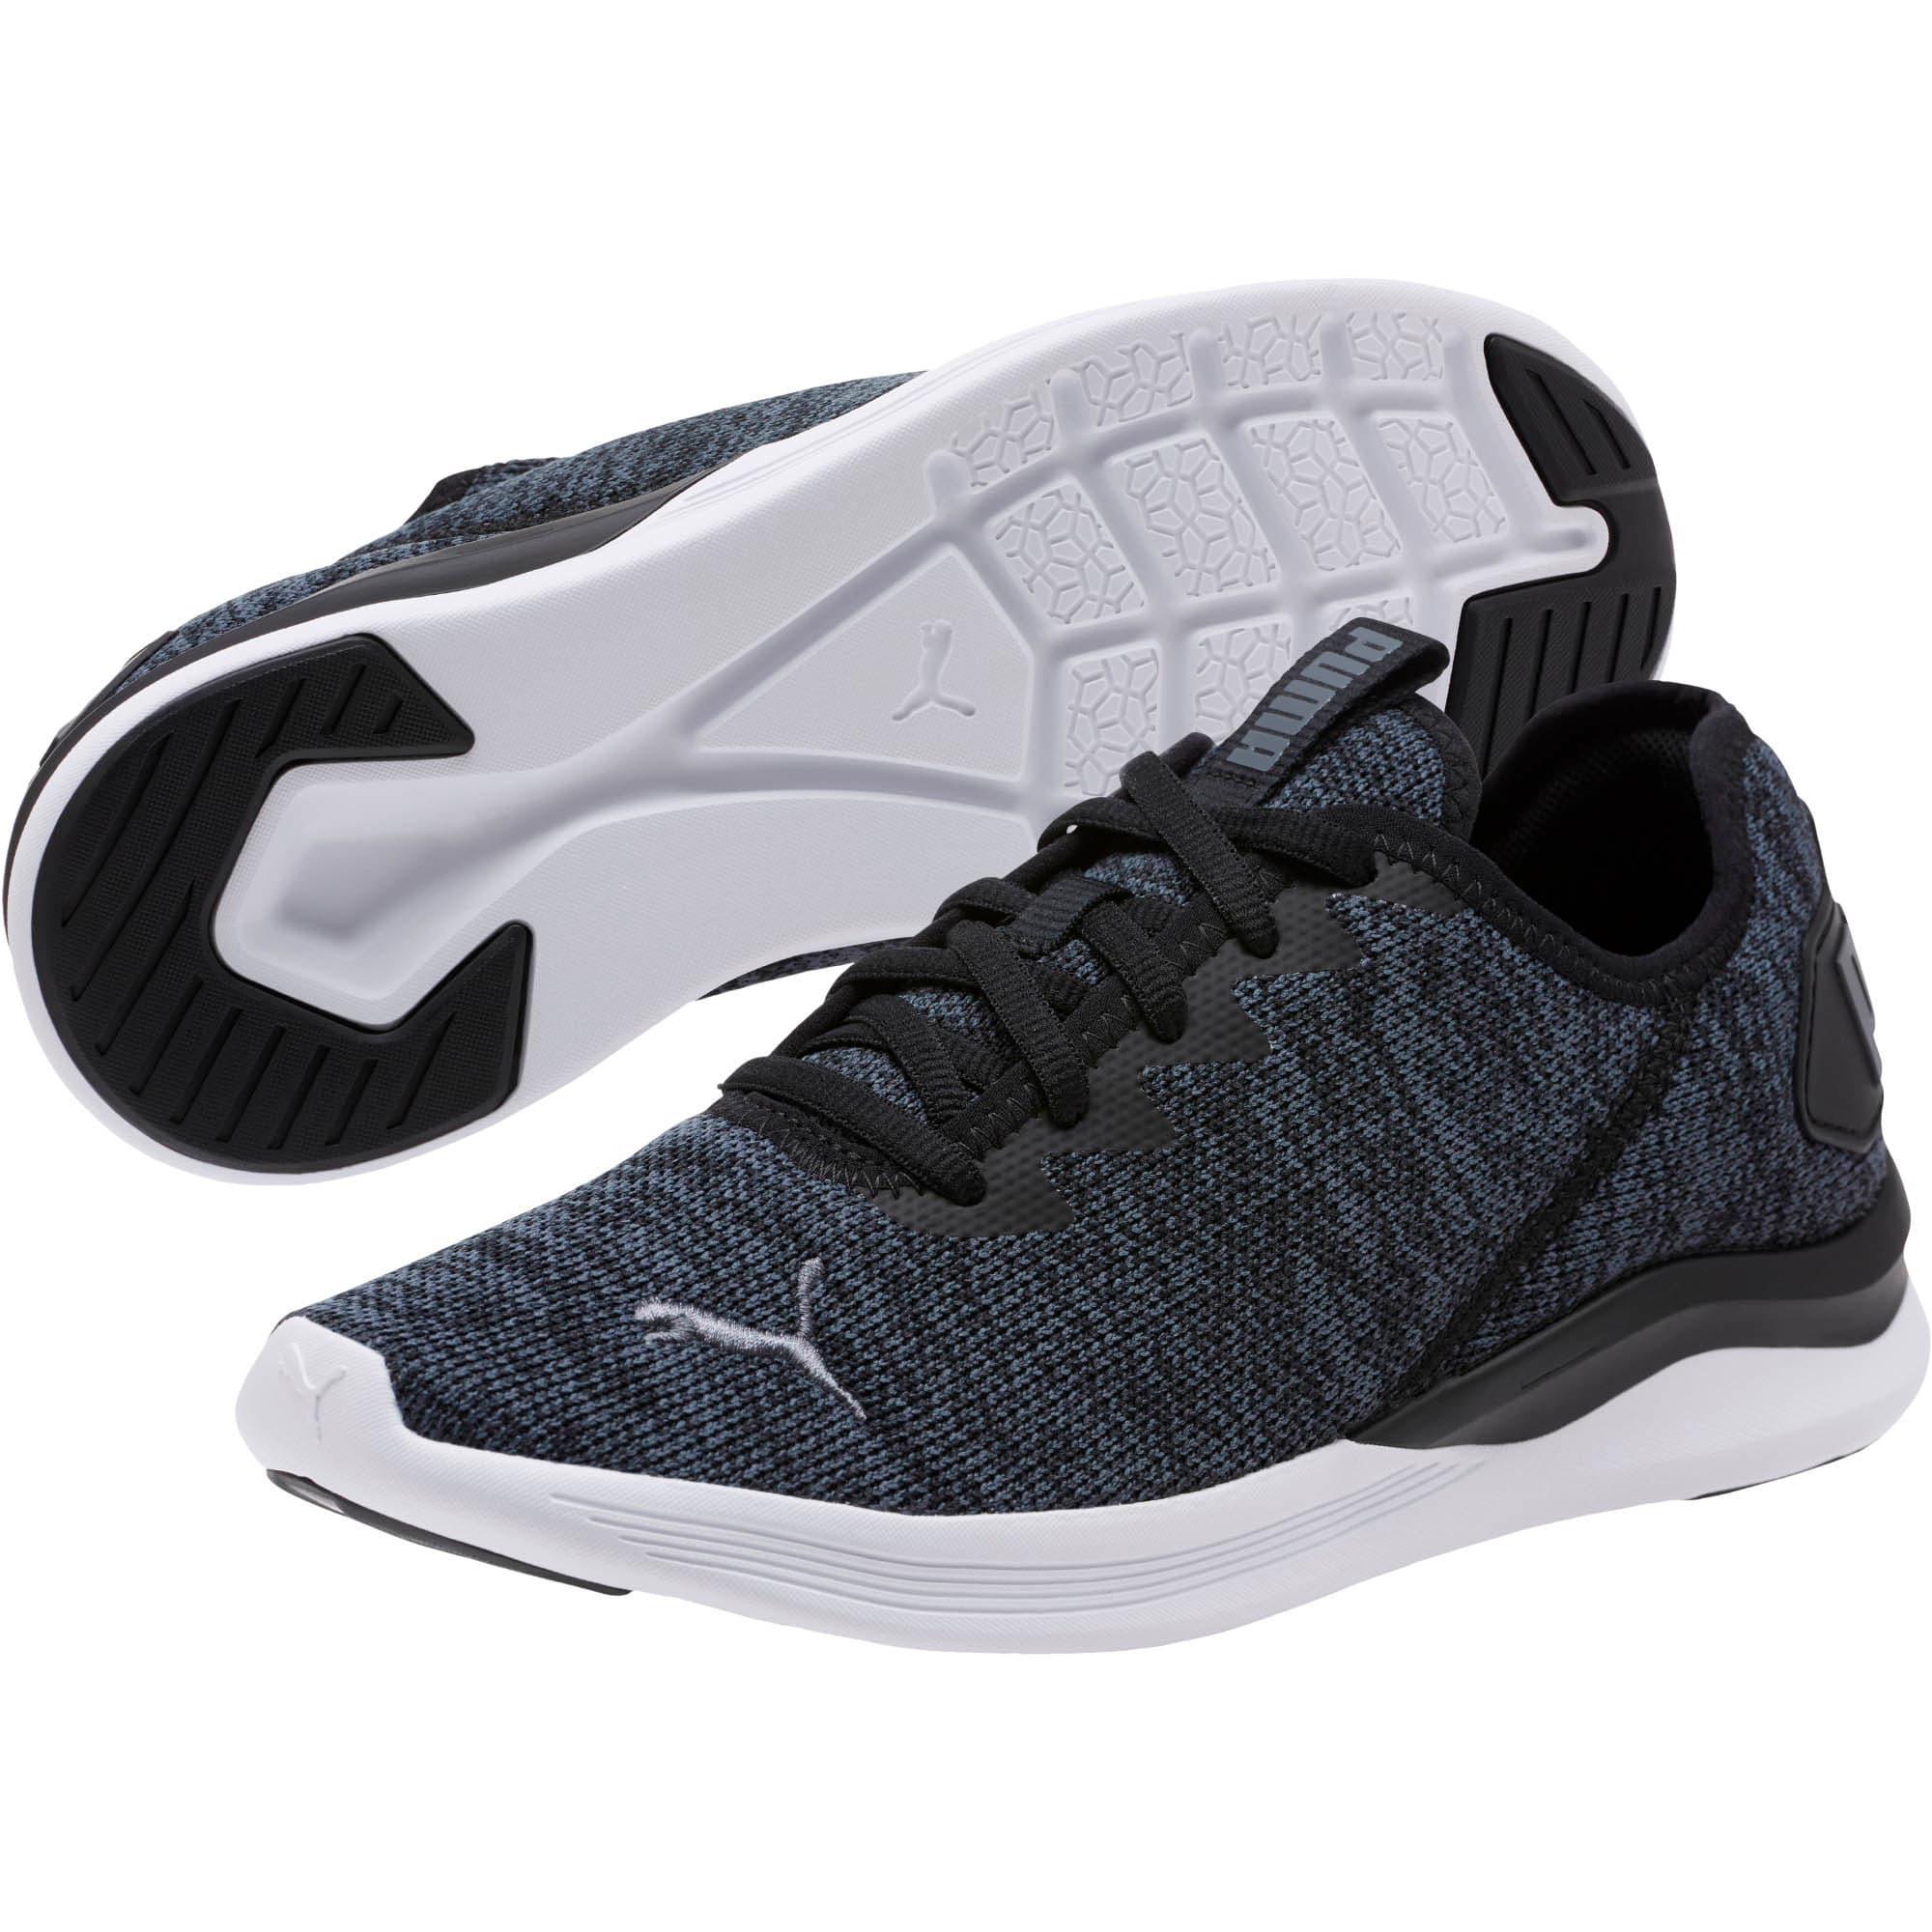 Thumbnail 2 of Ballast Women's Running Shoes, Puma Black-Iron Gate, medium